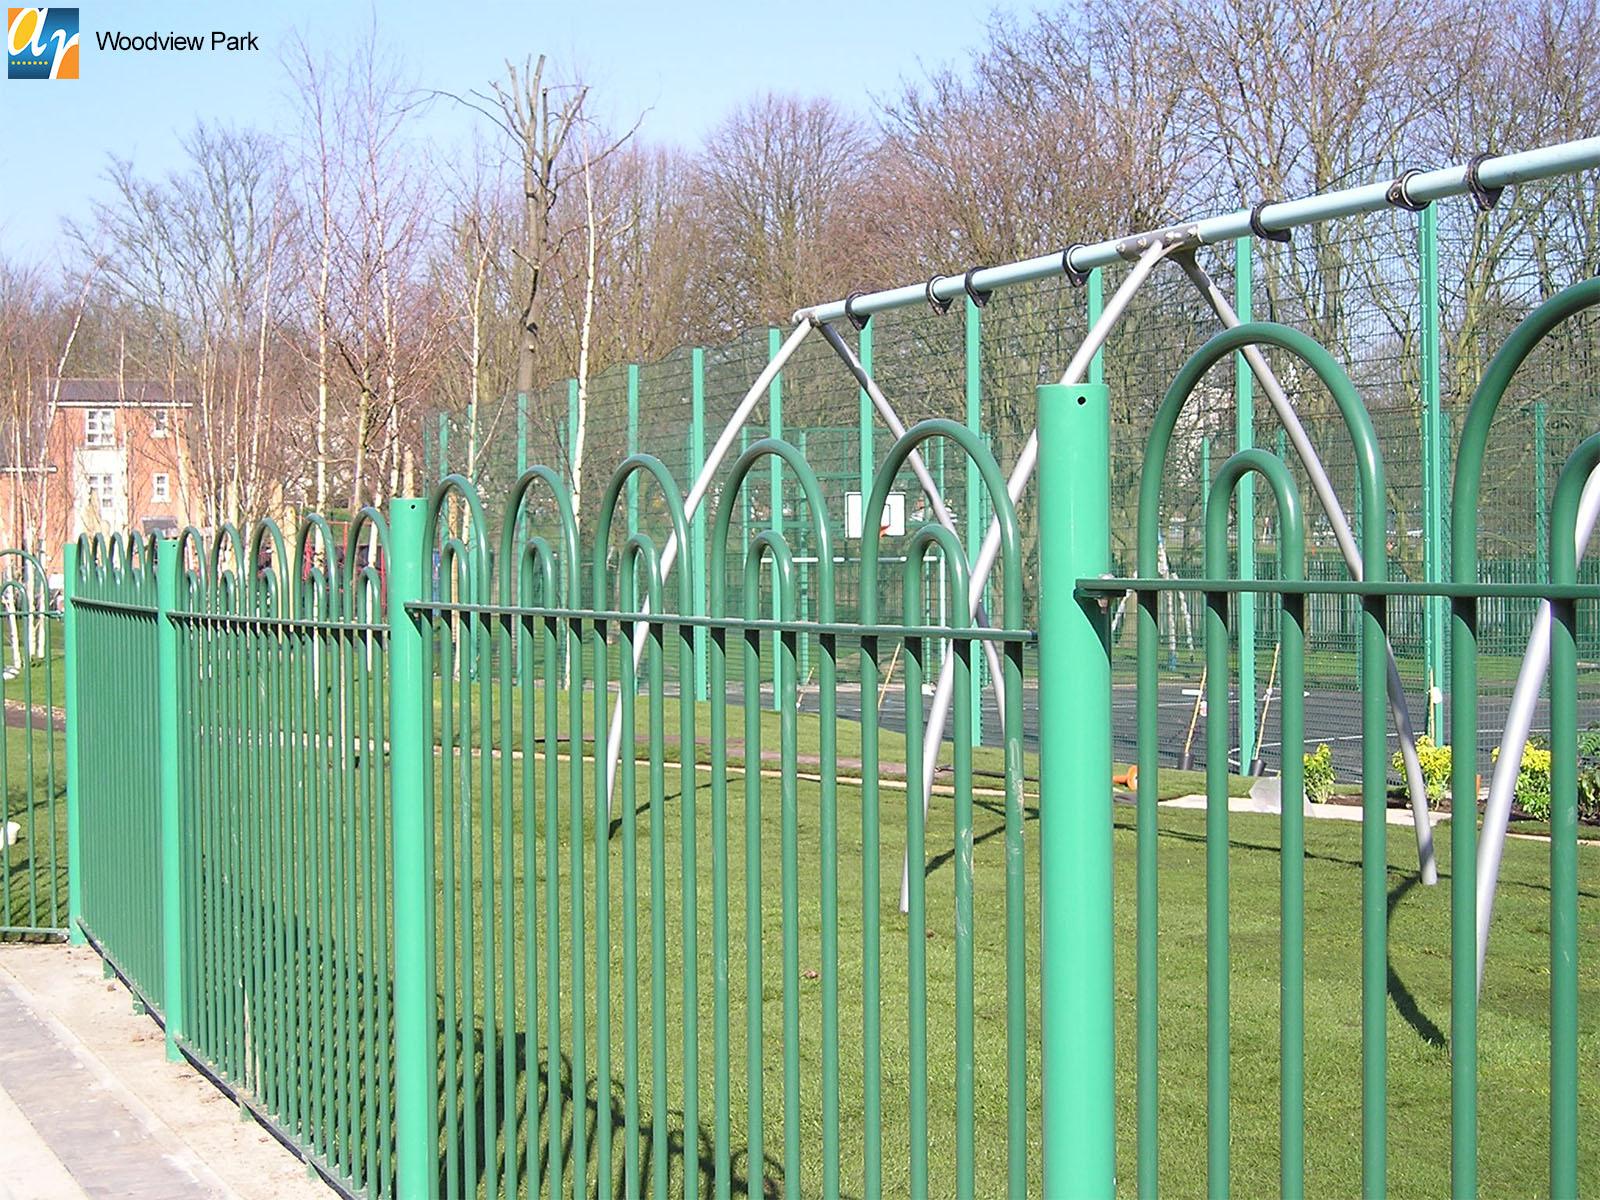 Woodview Park Holinwell metal railings